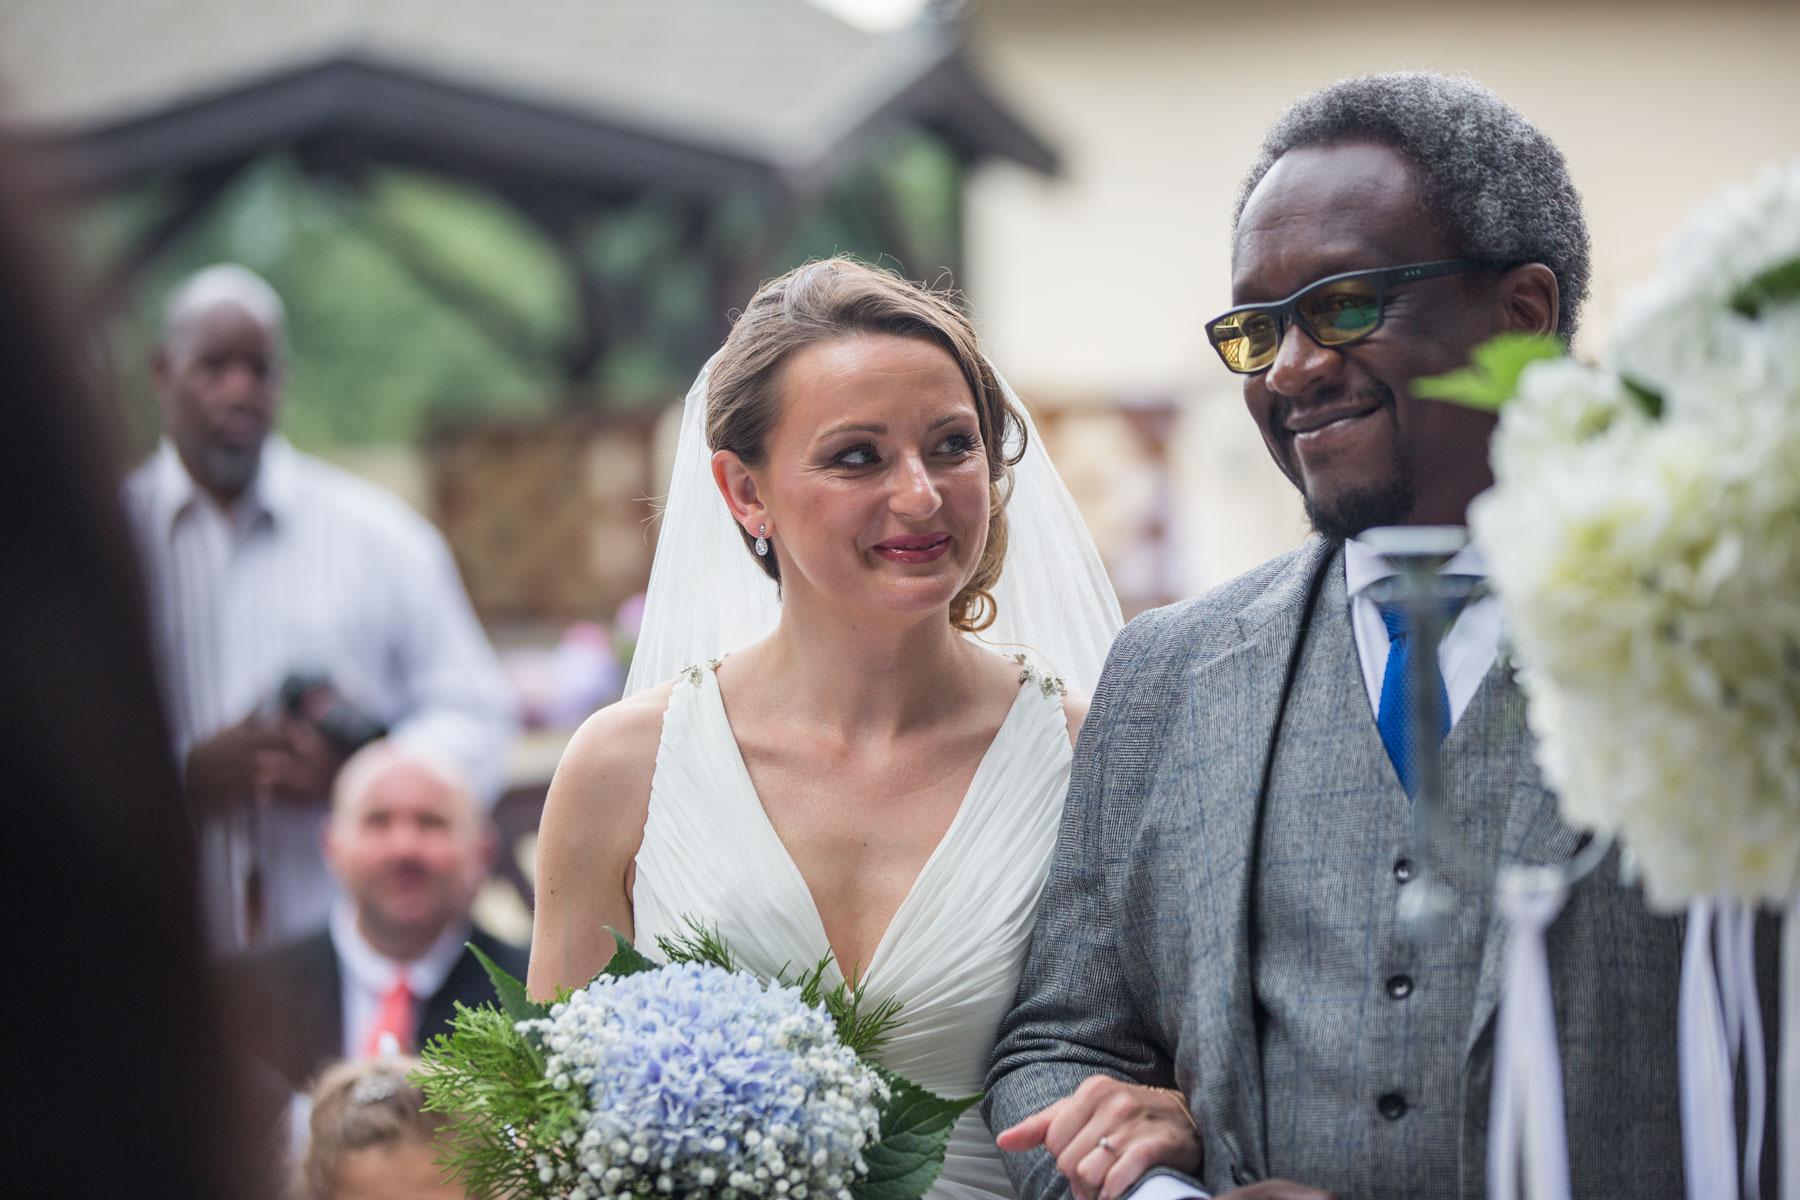 International Destination Wedding Photographer - Richard Murgatroyd